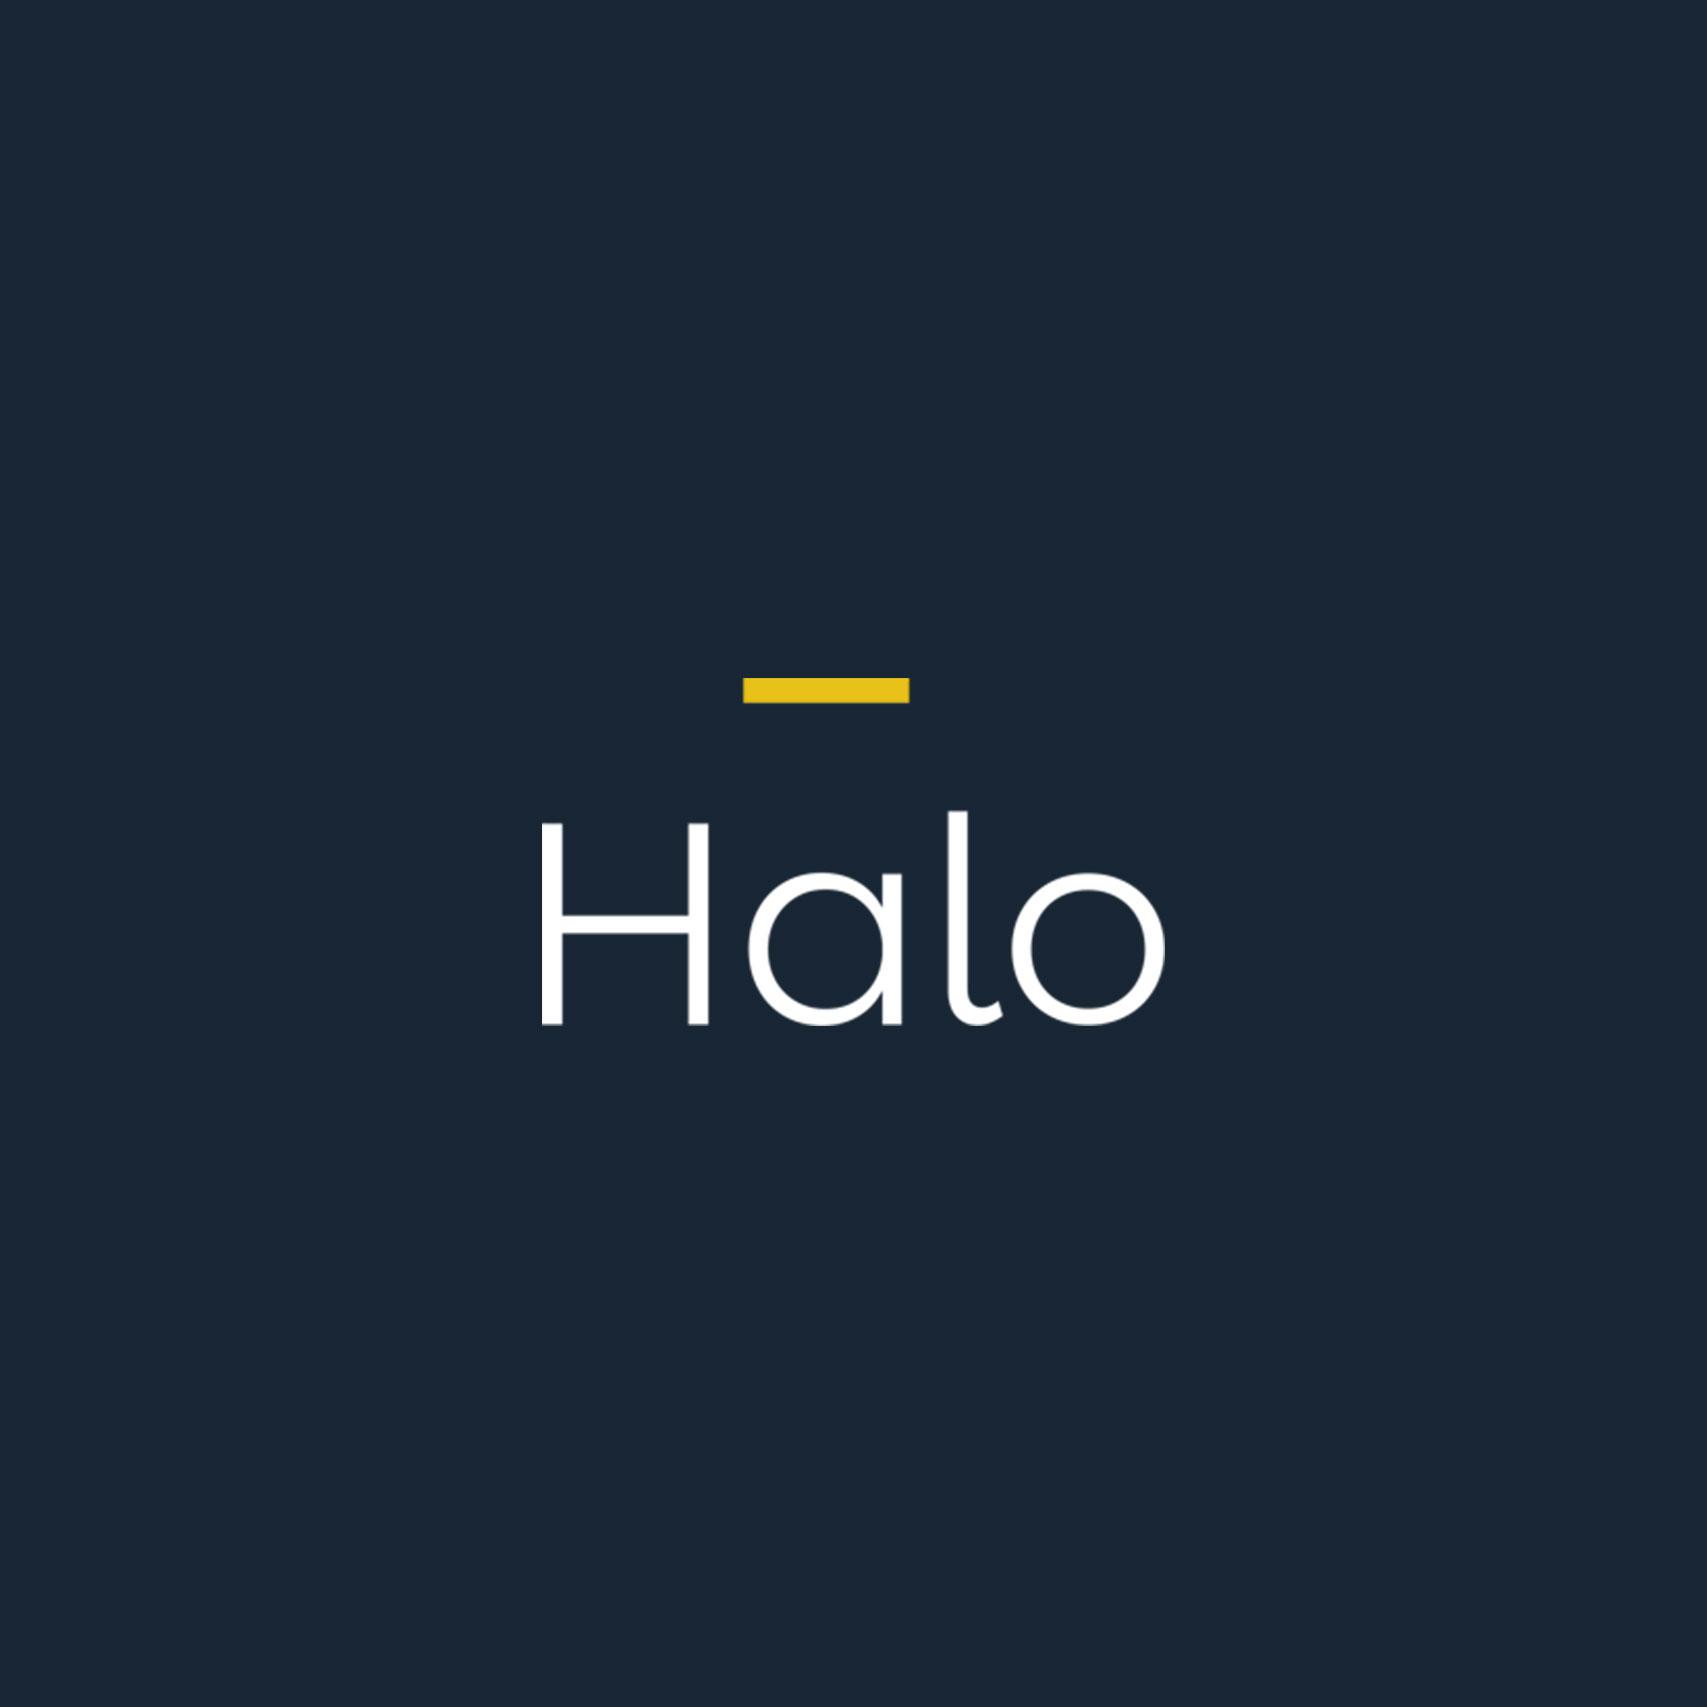 Creative custom logo design for Halo London